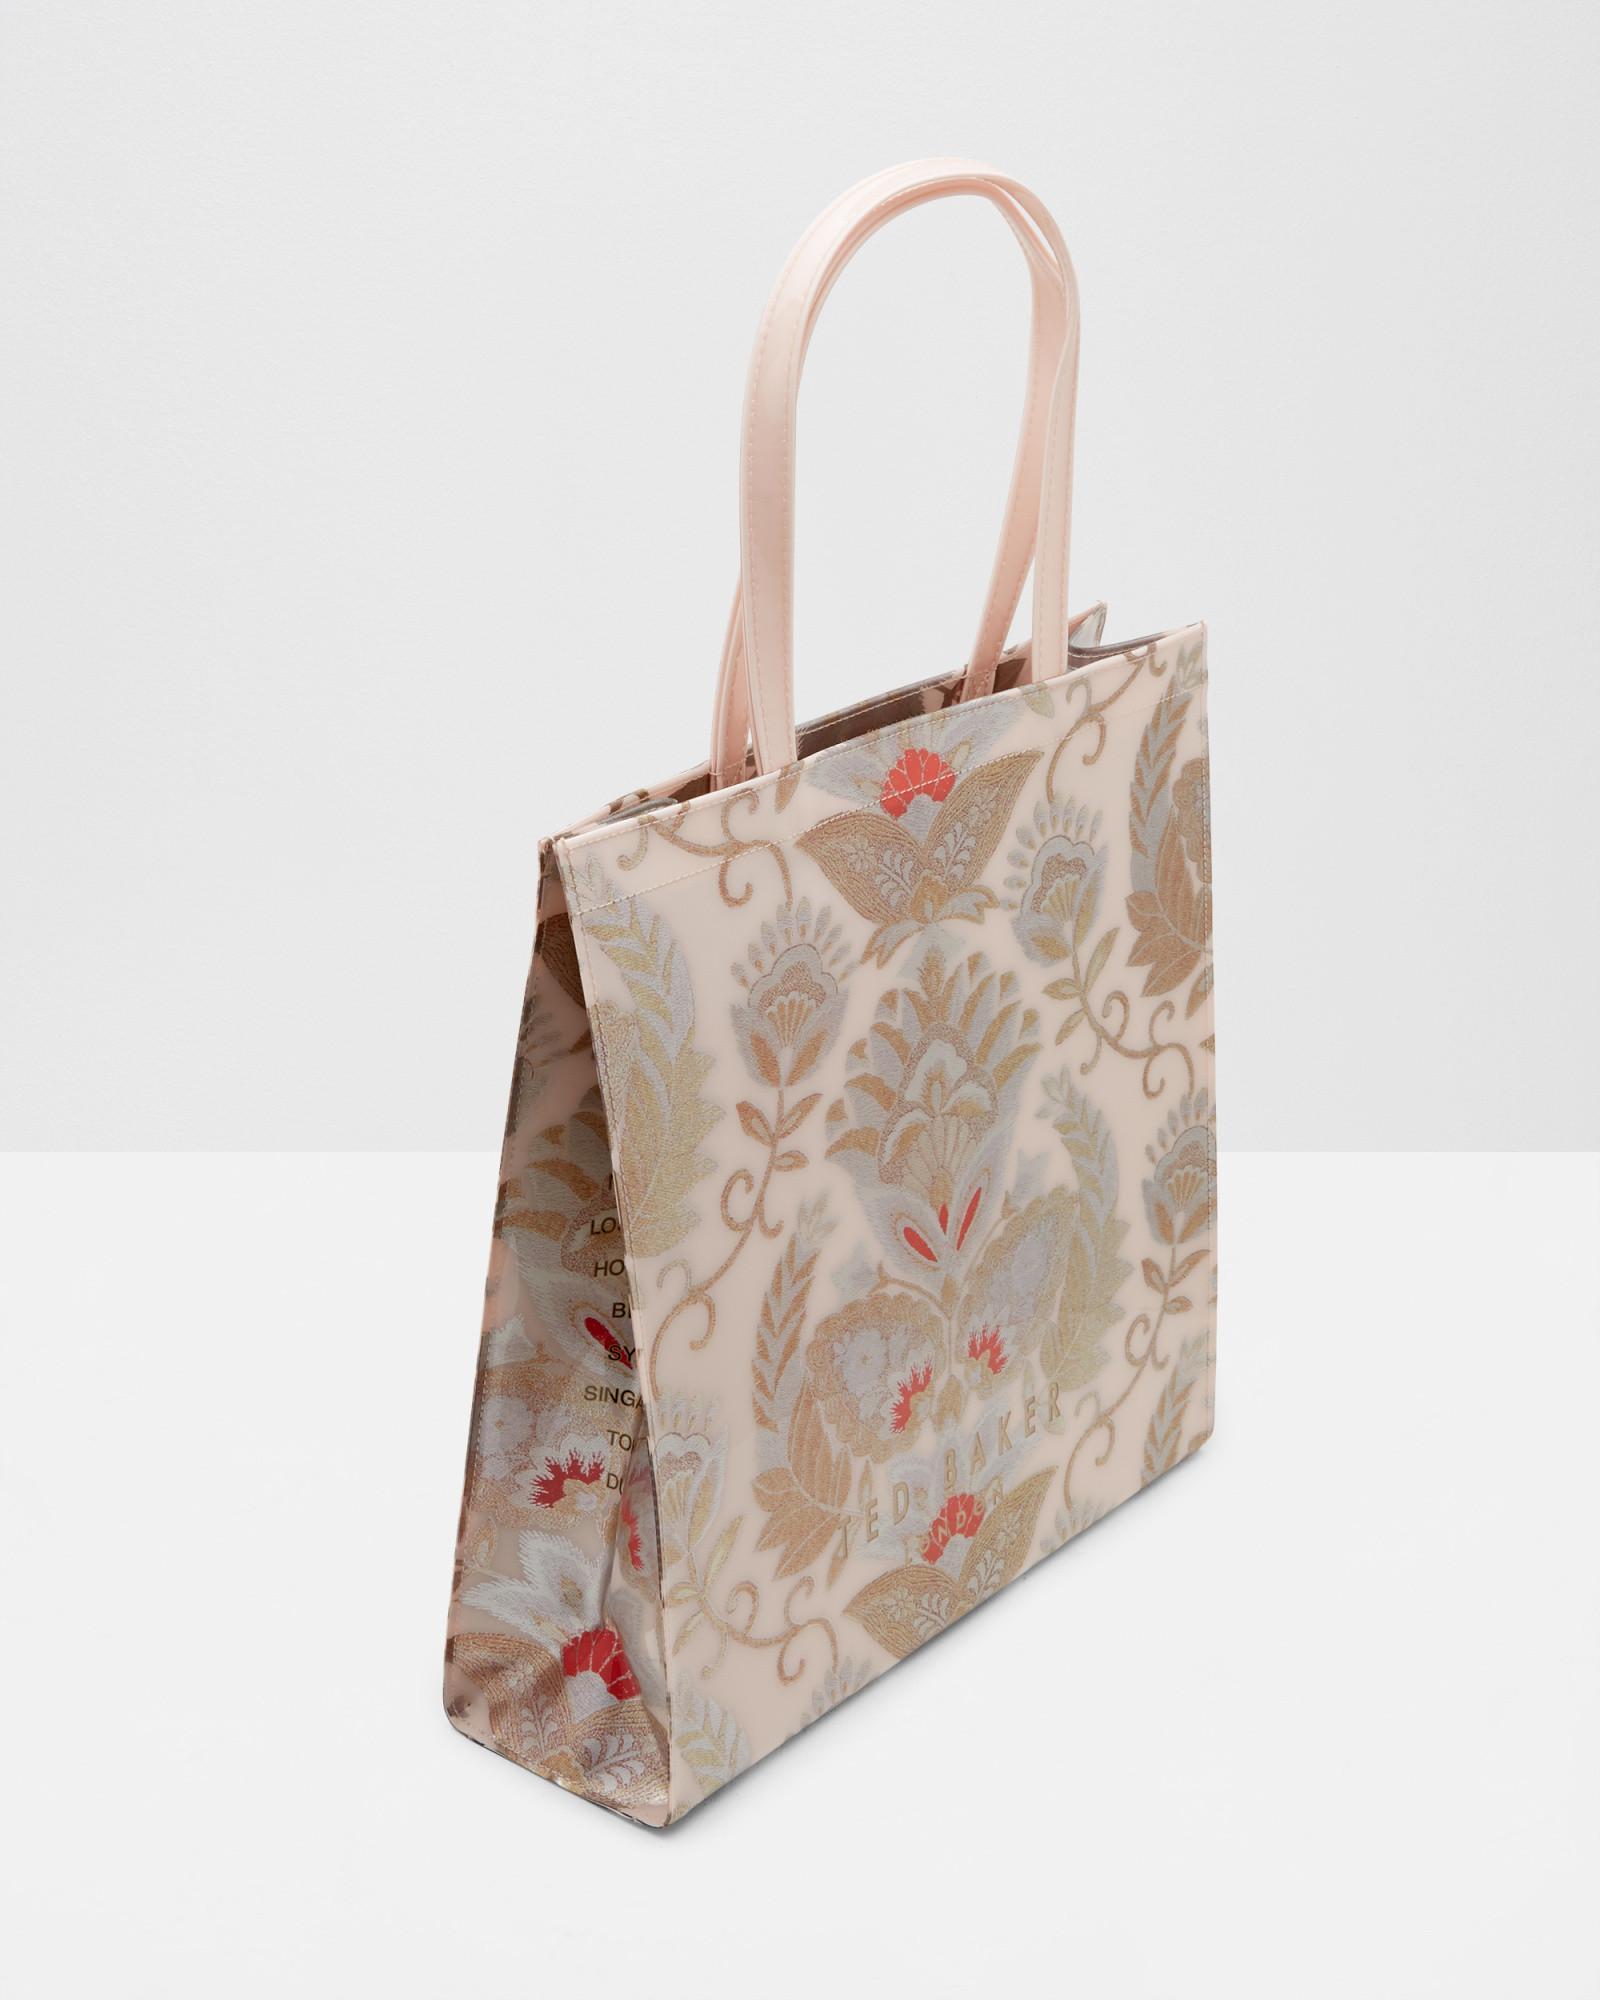 55c604bf9c553 Lyst - Ted Baker Opulent Orient Large Shopper Bag in Pink